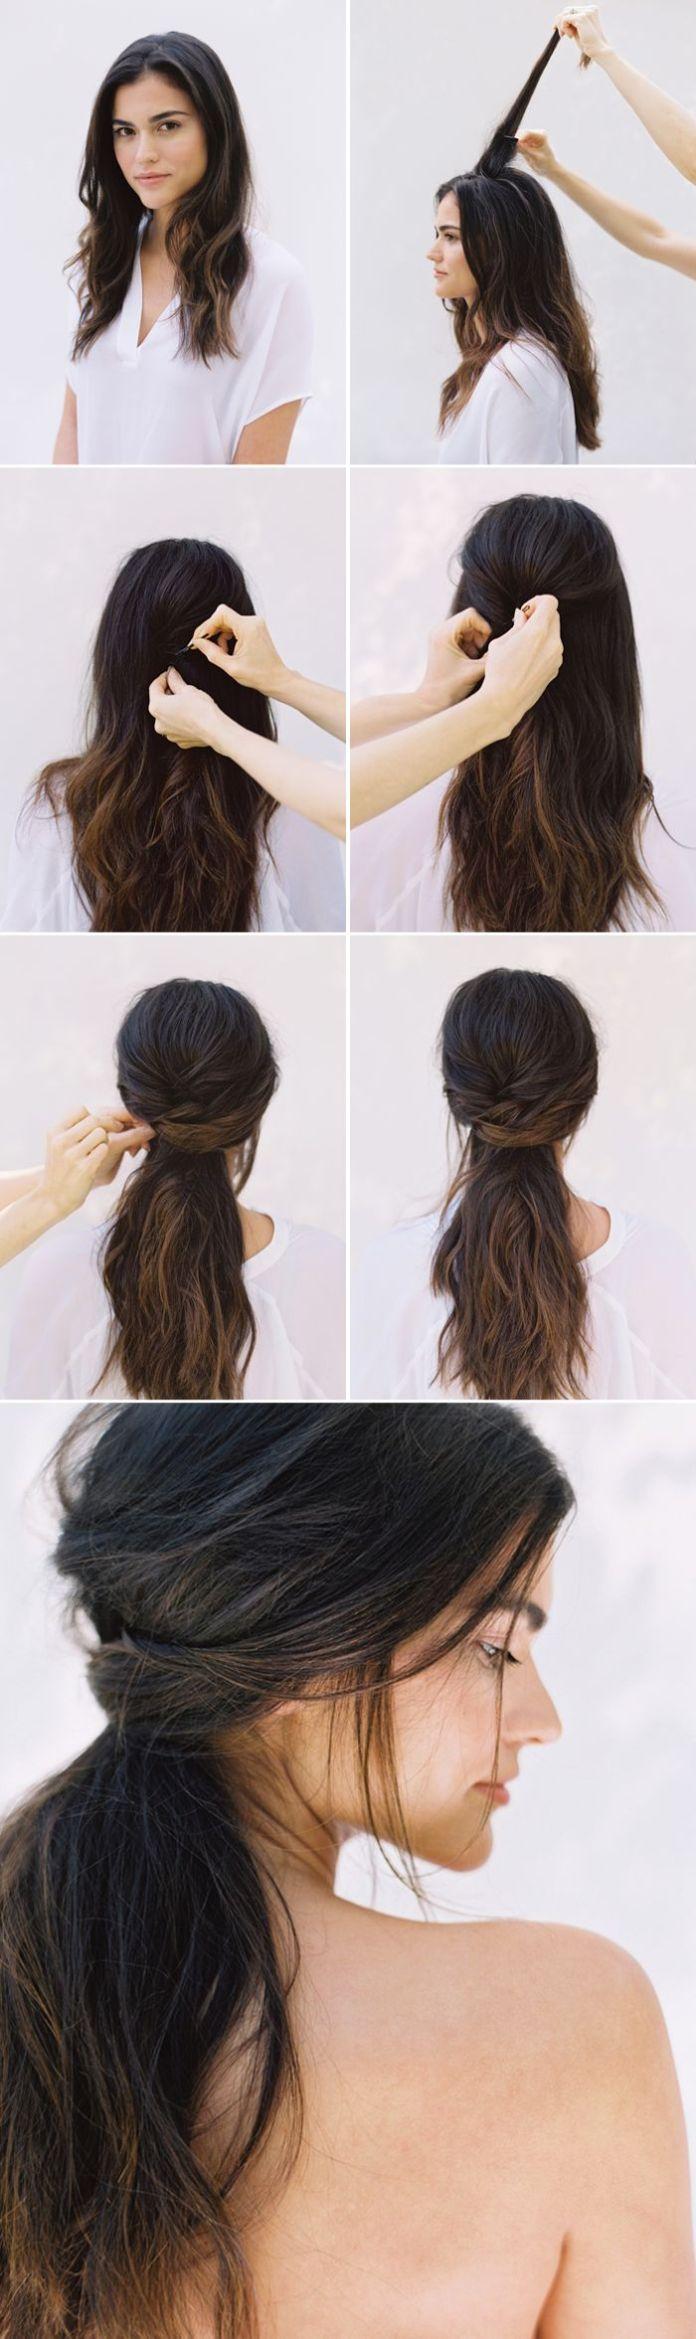 Wedding-Half-up-Half-down Hair Tutorials to Style Your Hair